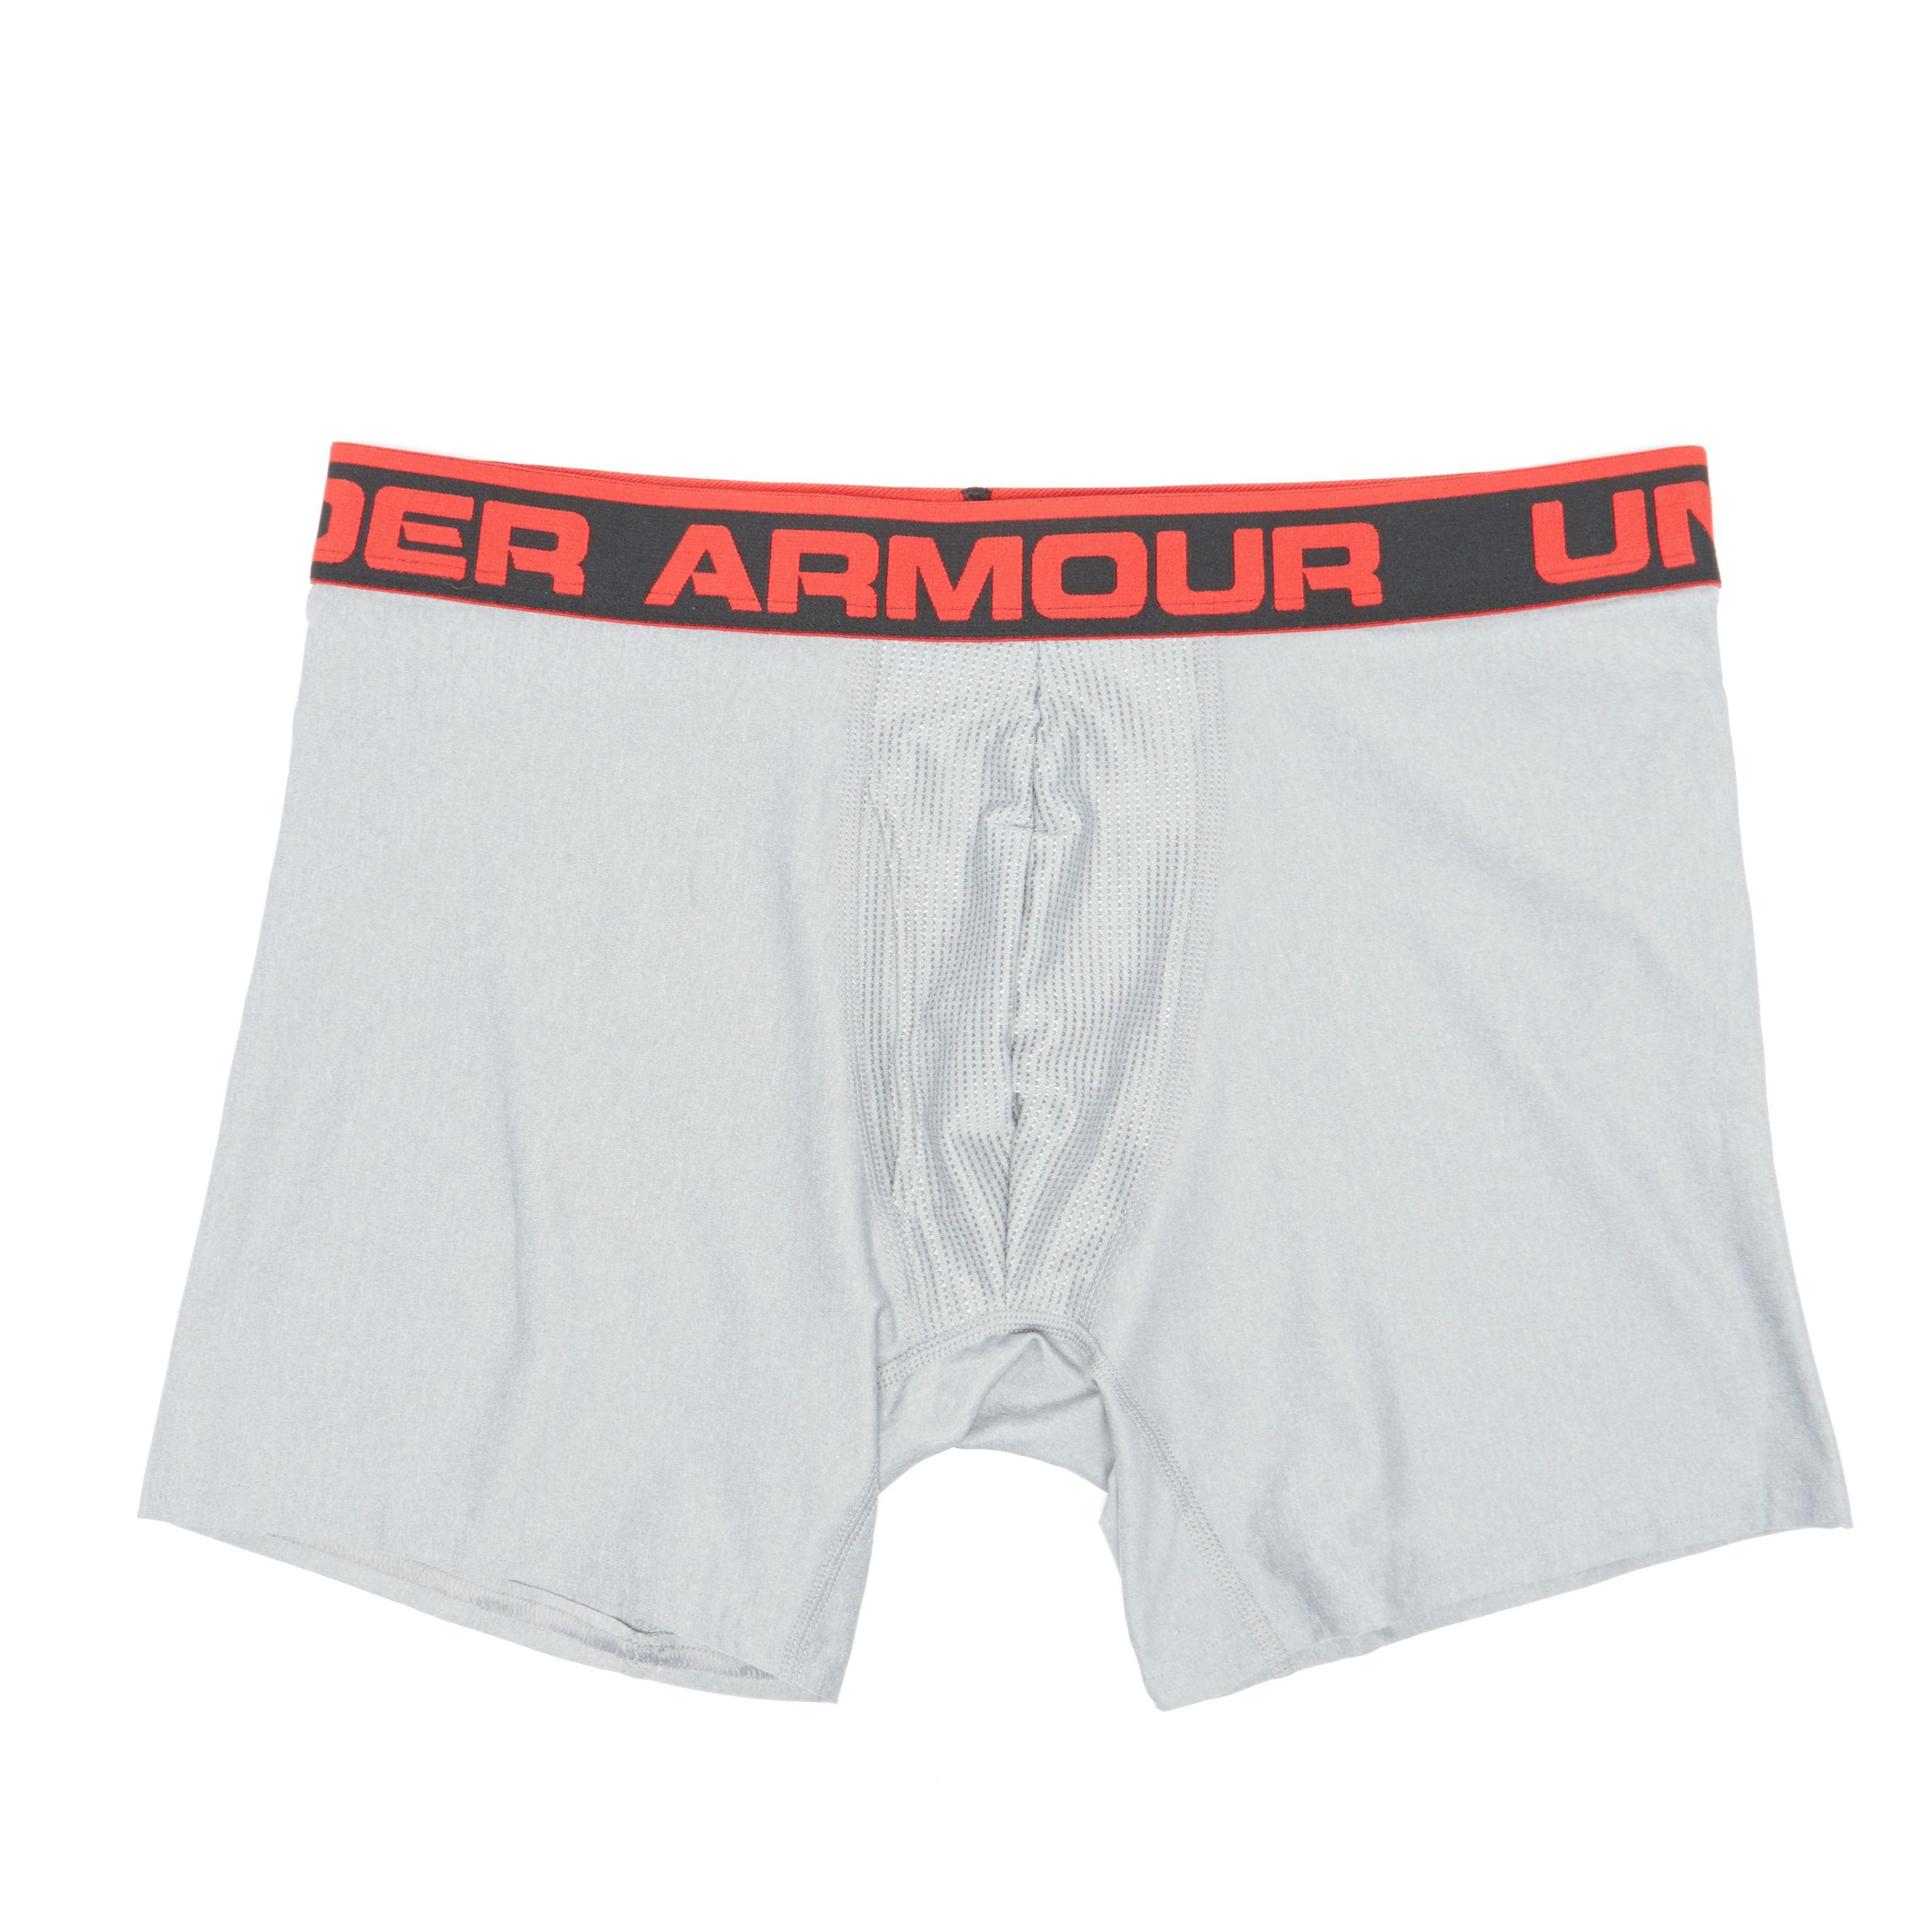 UNDER ARMOUR Men's Original 6 Boxer